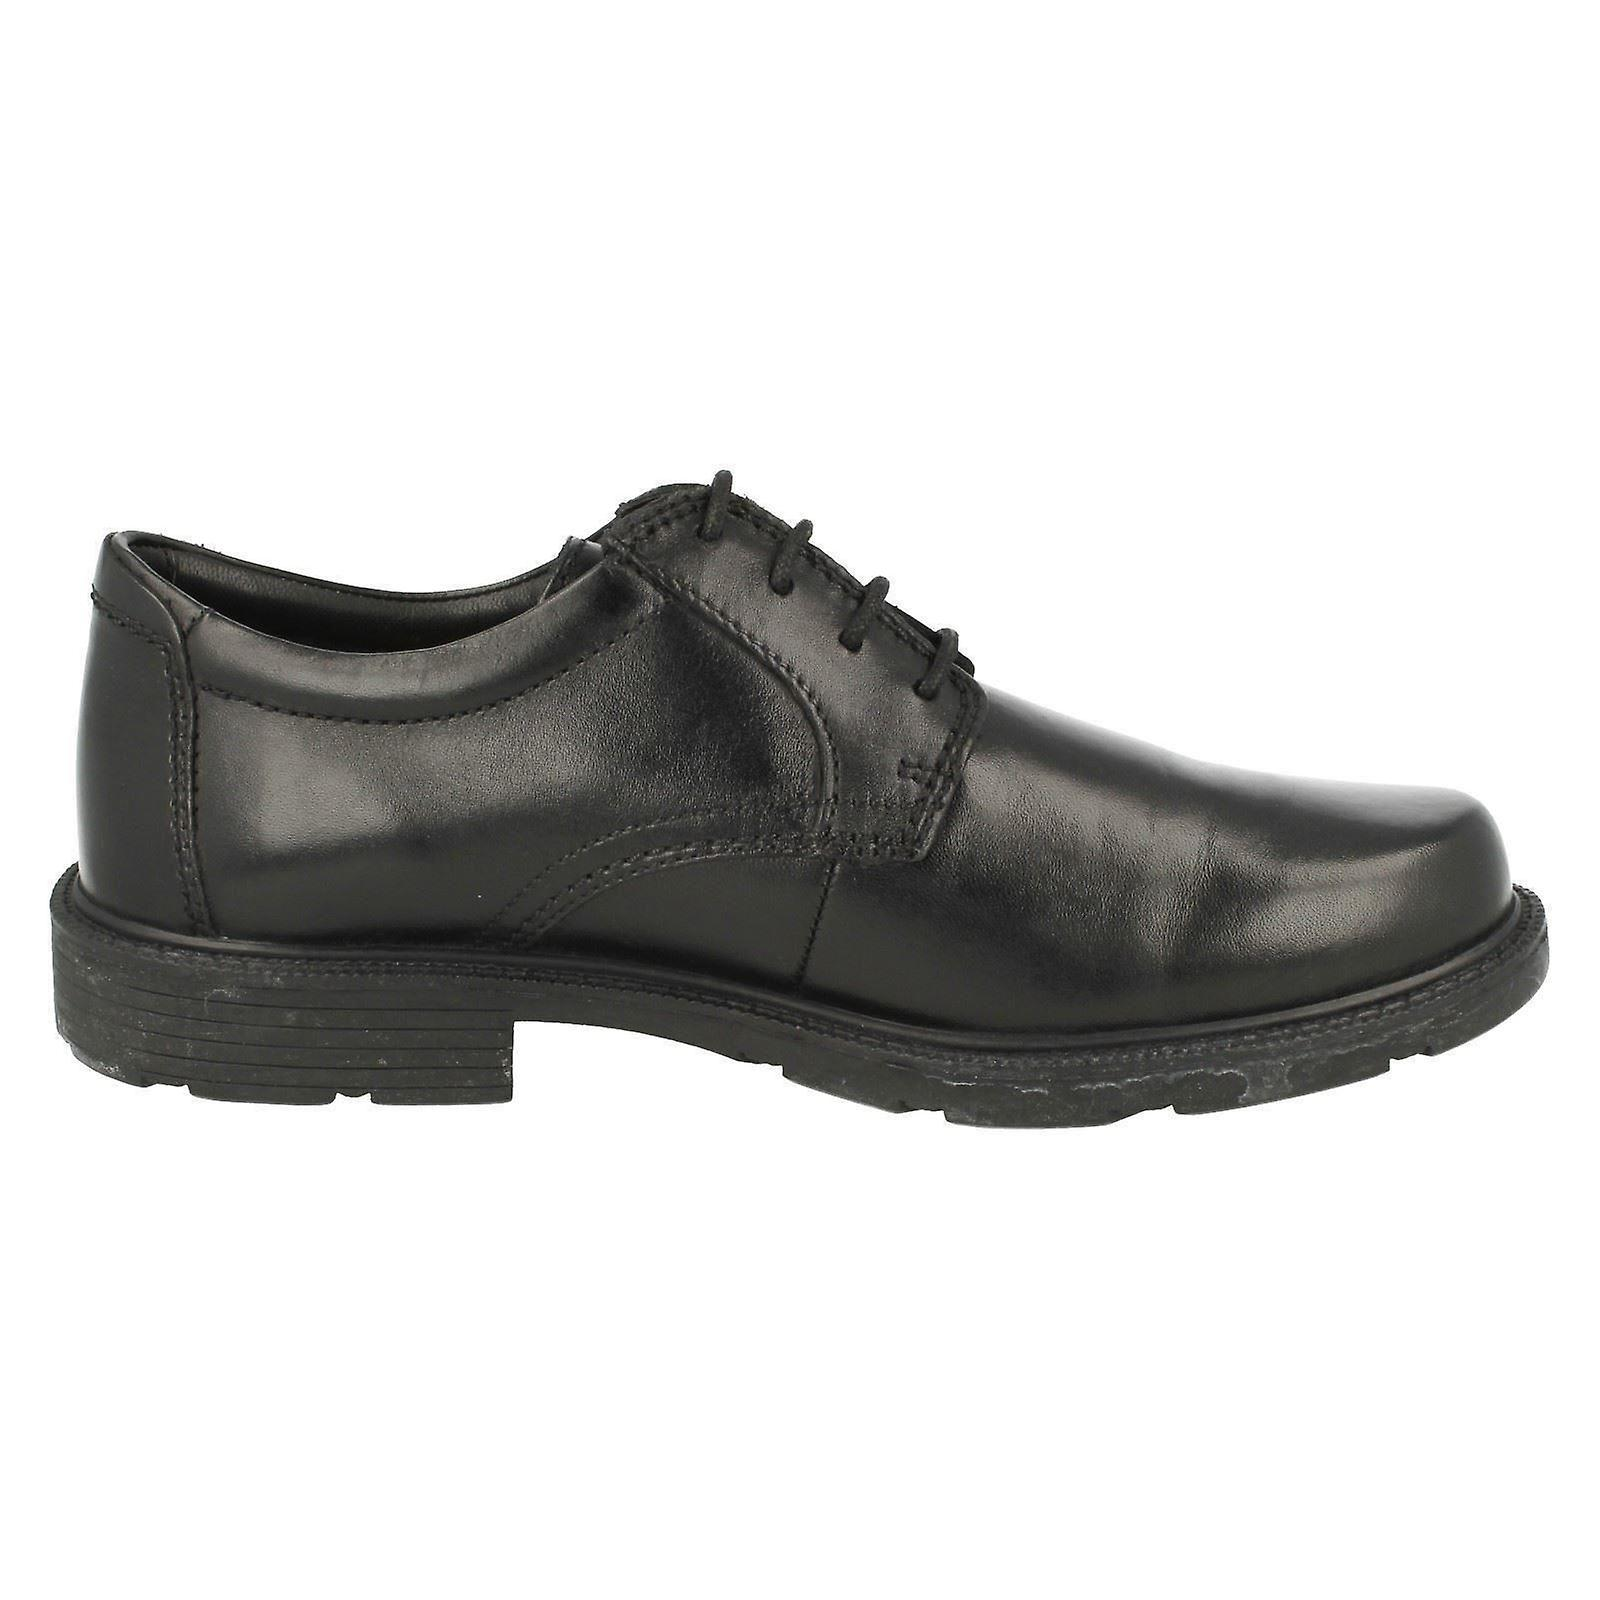 Herren Clarks Lace Up Schuhe Lair Watch